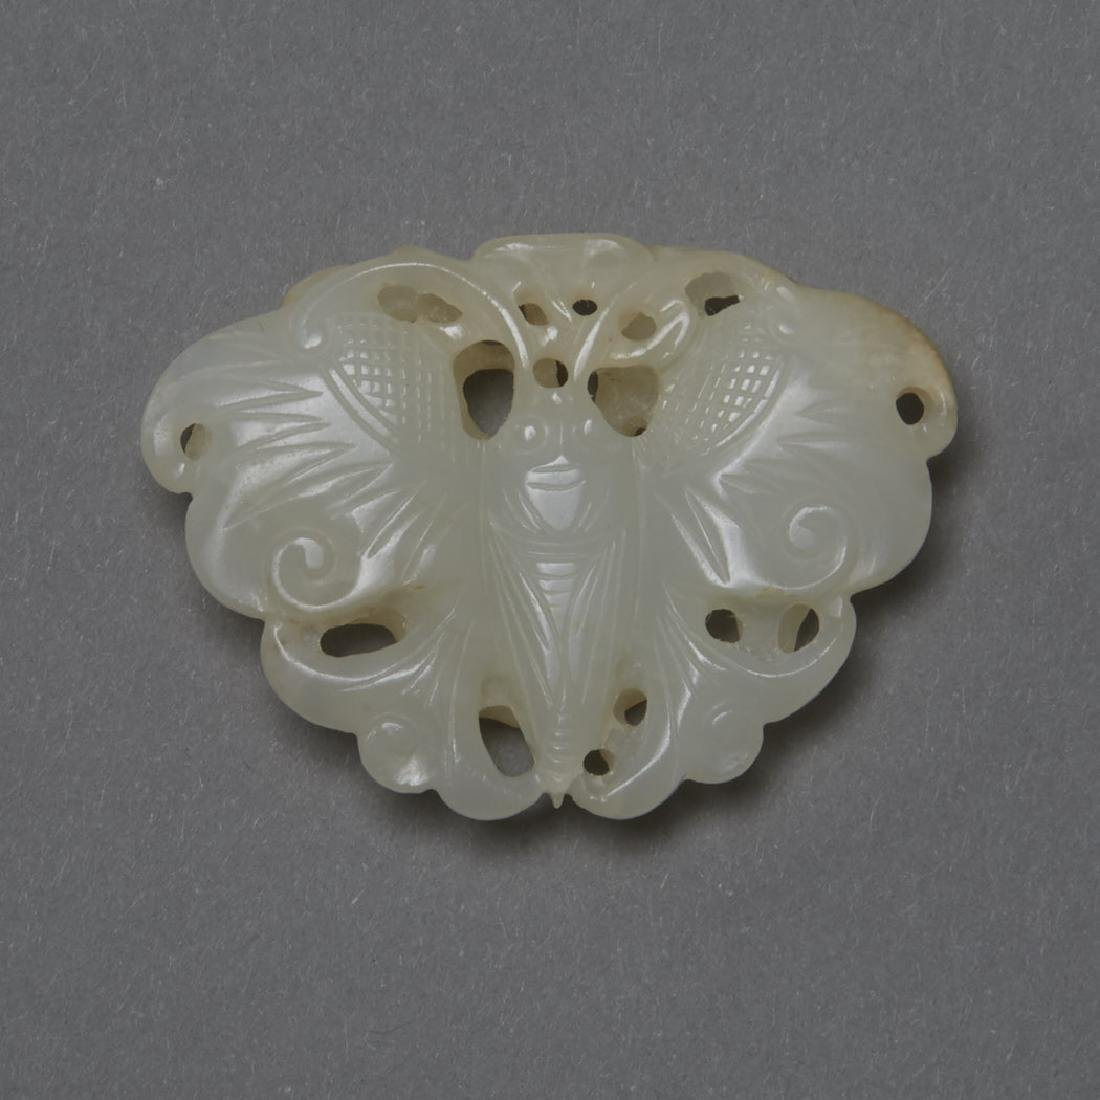 Chinese 18th/19th C Qing white Jade Pendant - BTC Acpt - 3